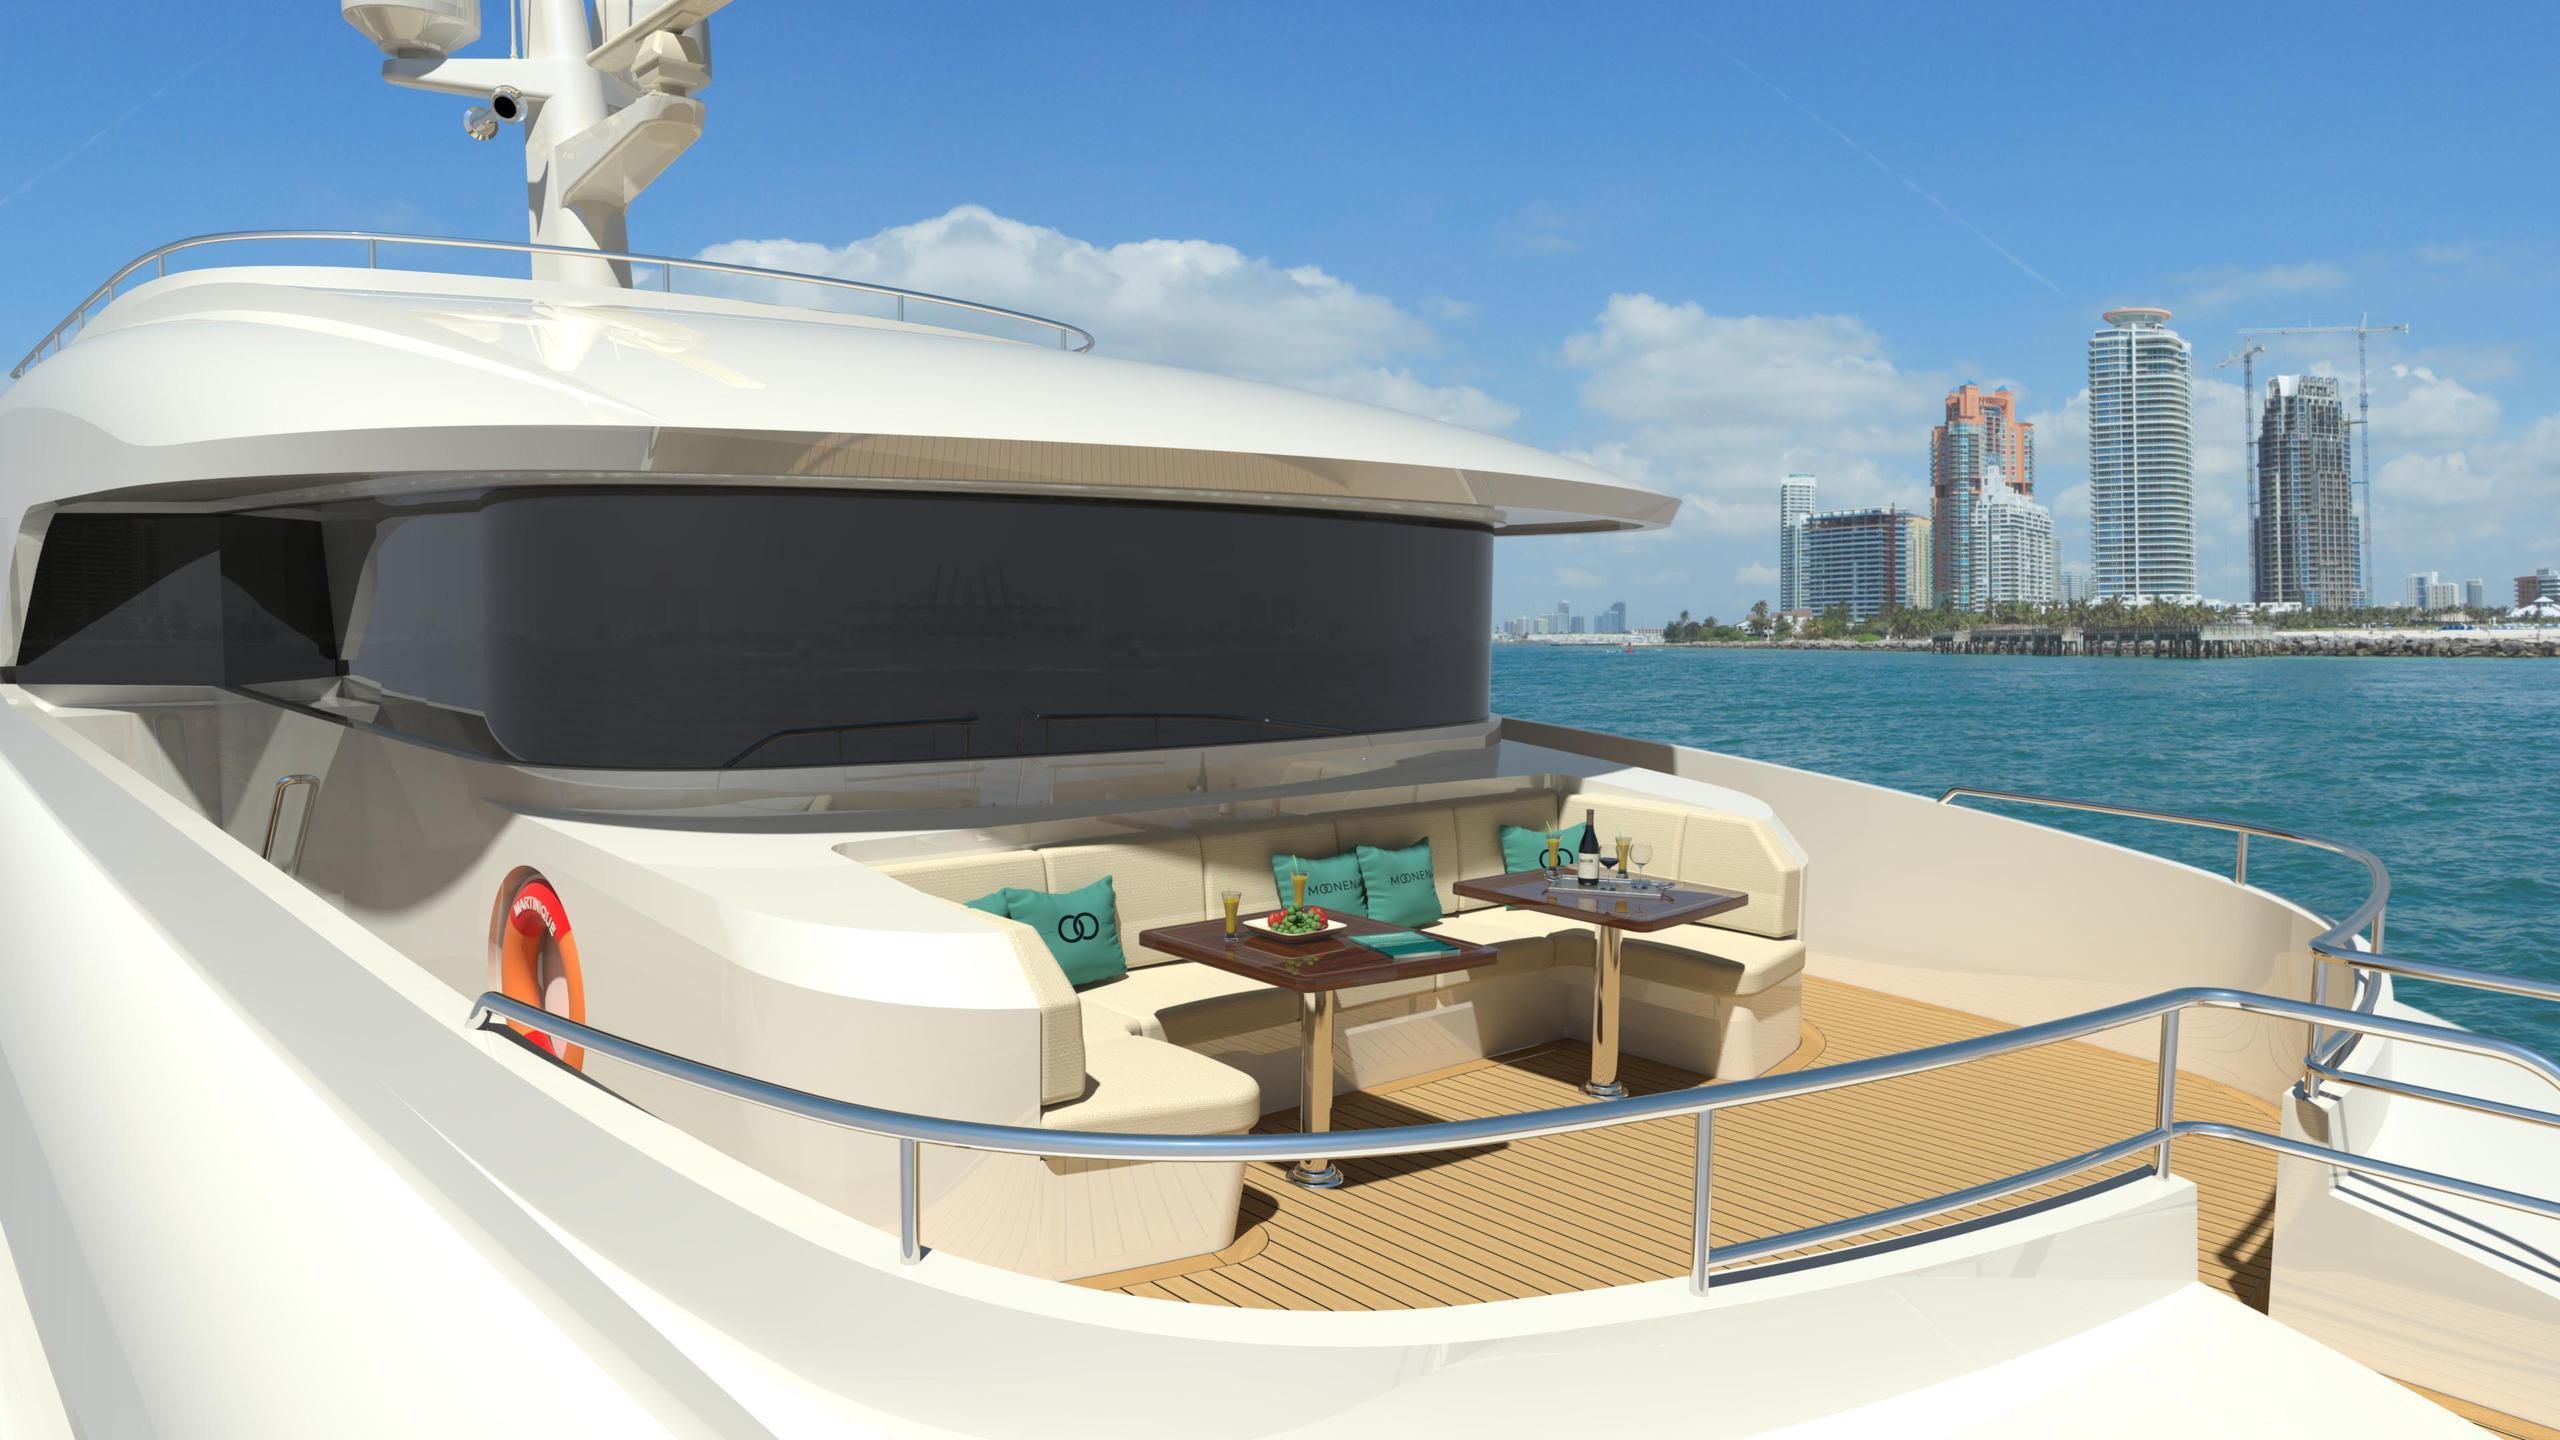 martinique motoryacht moonen 2018 36m rendering wheelhouse